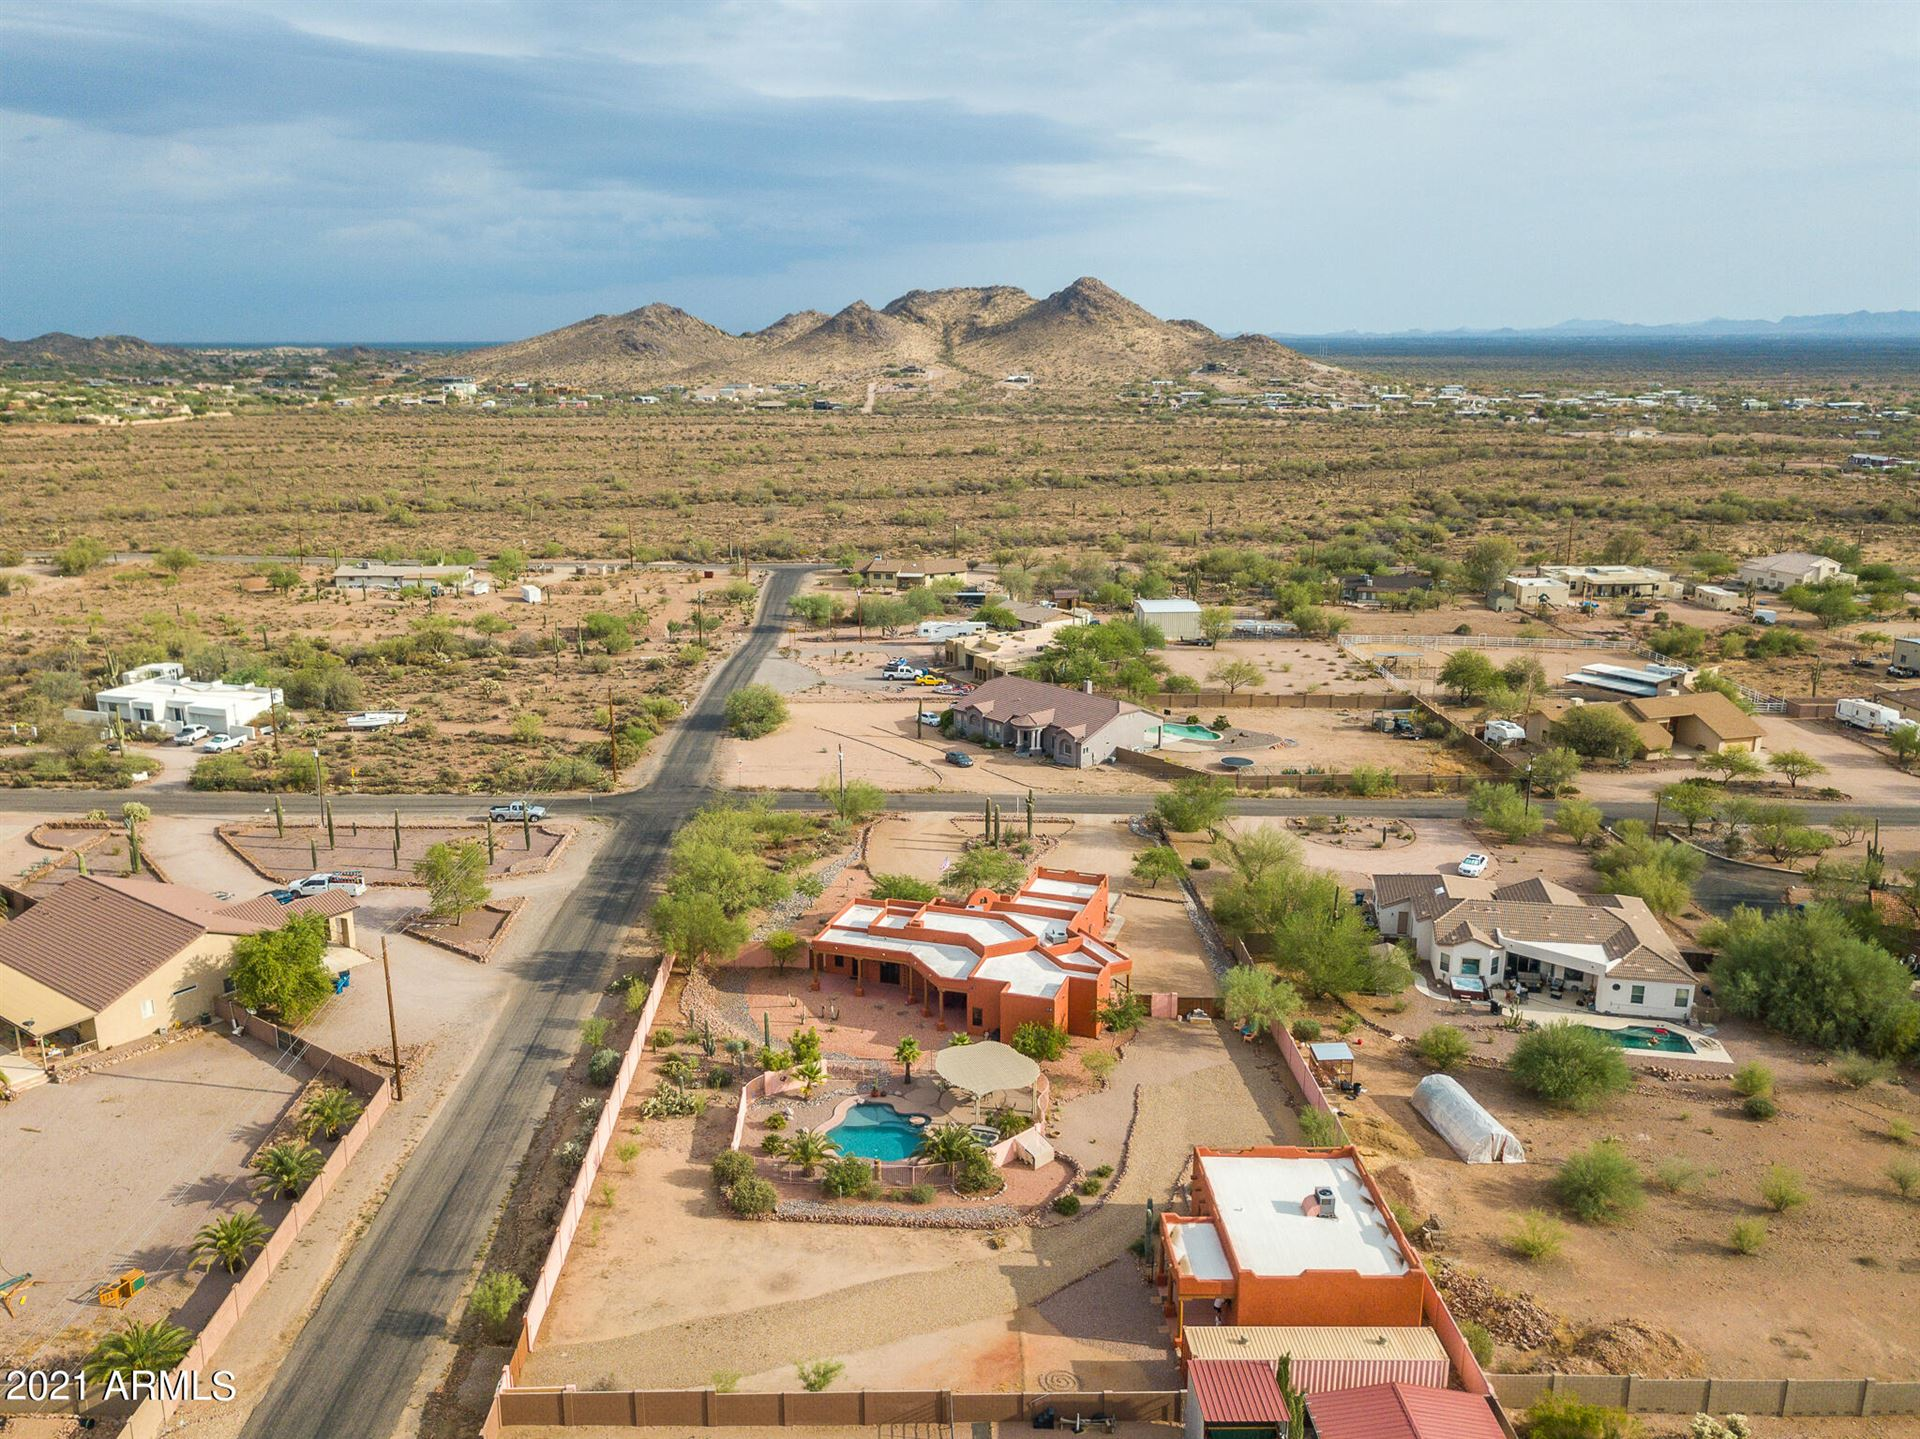 Photo of 5984 E 22ND Avenue, Apache Junction, AZ 85119 (MLS # 6267404)